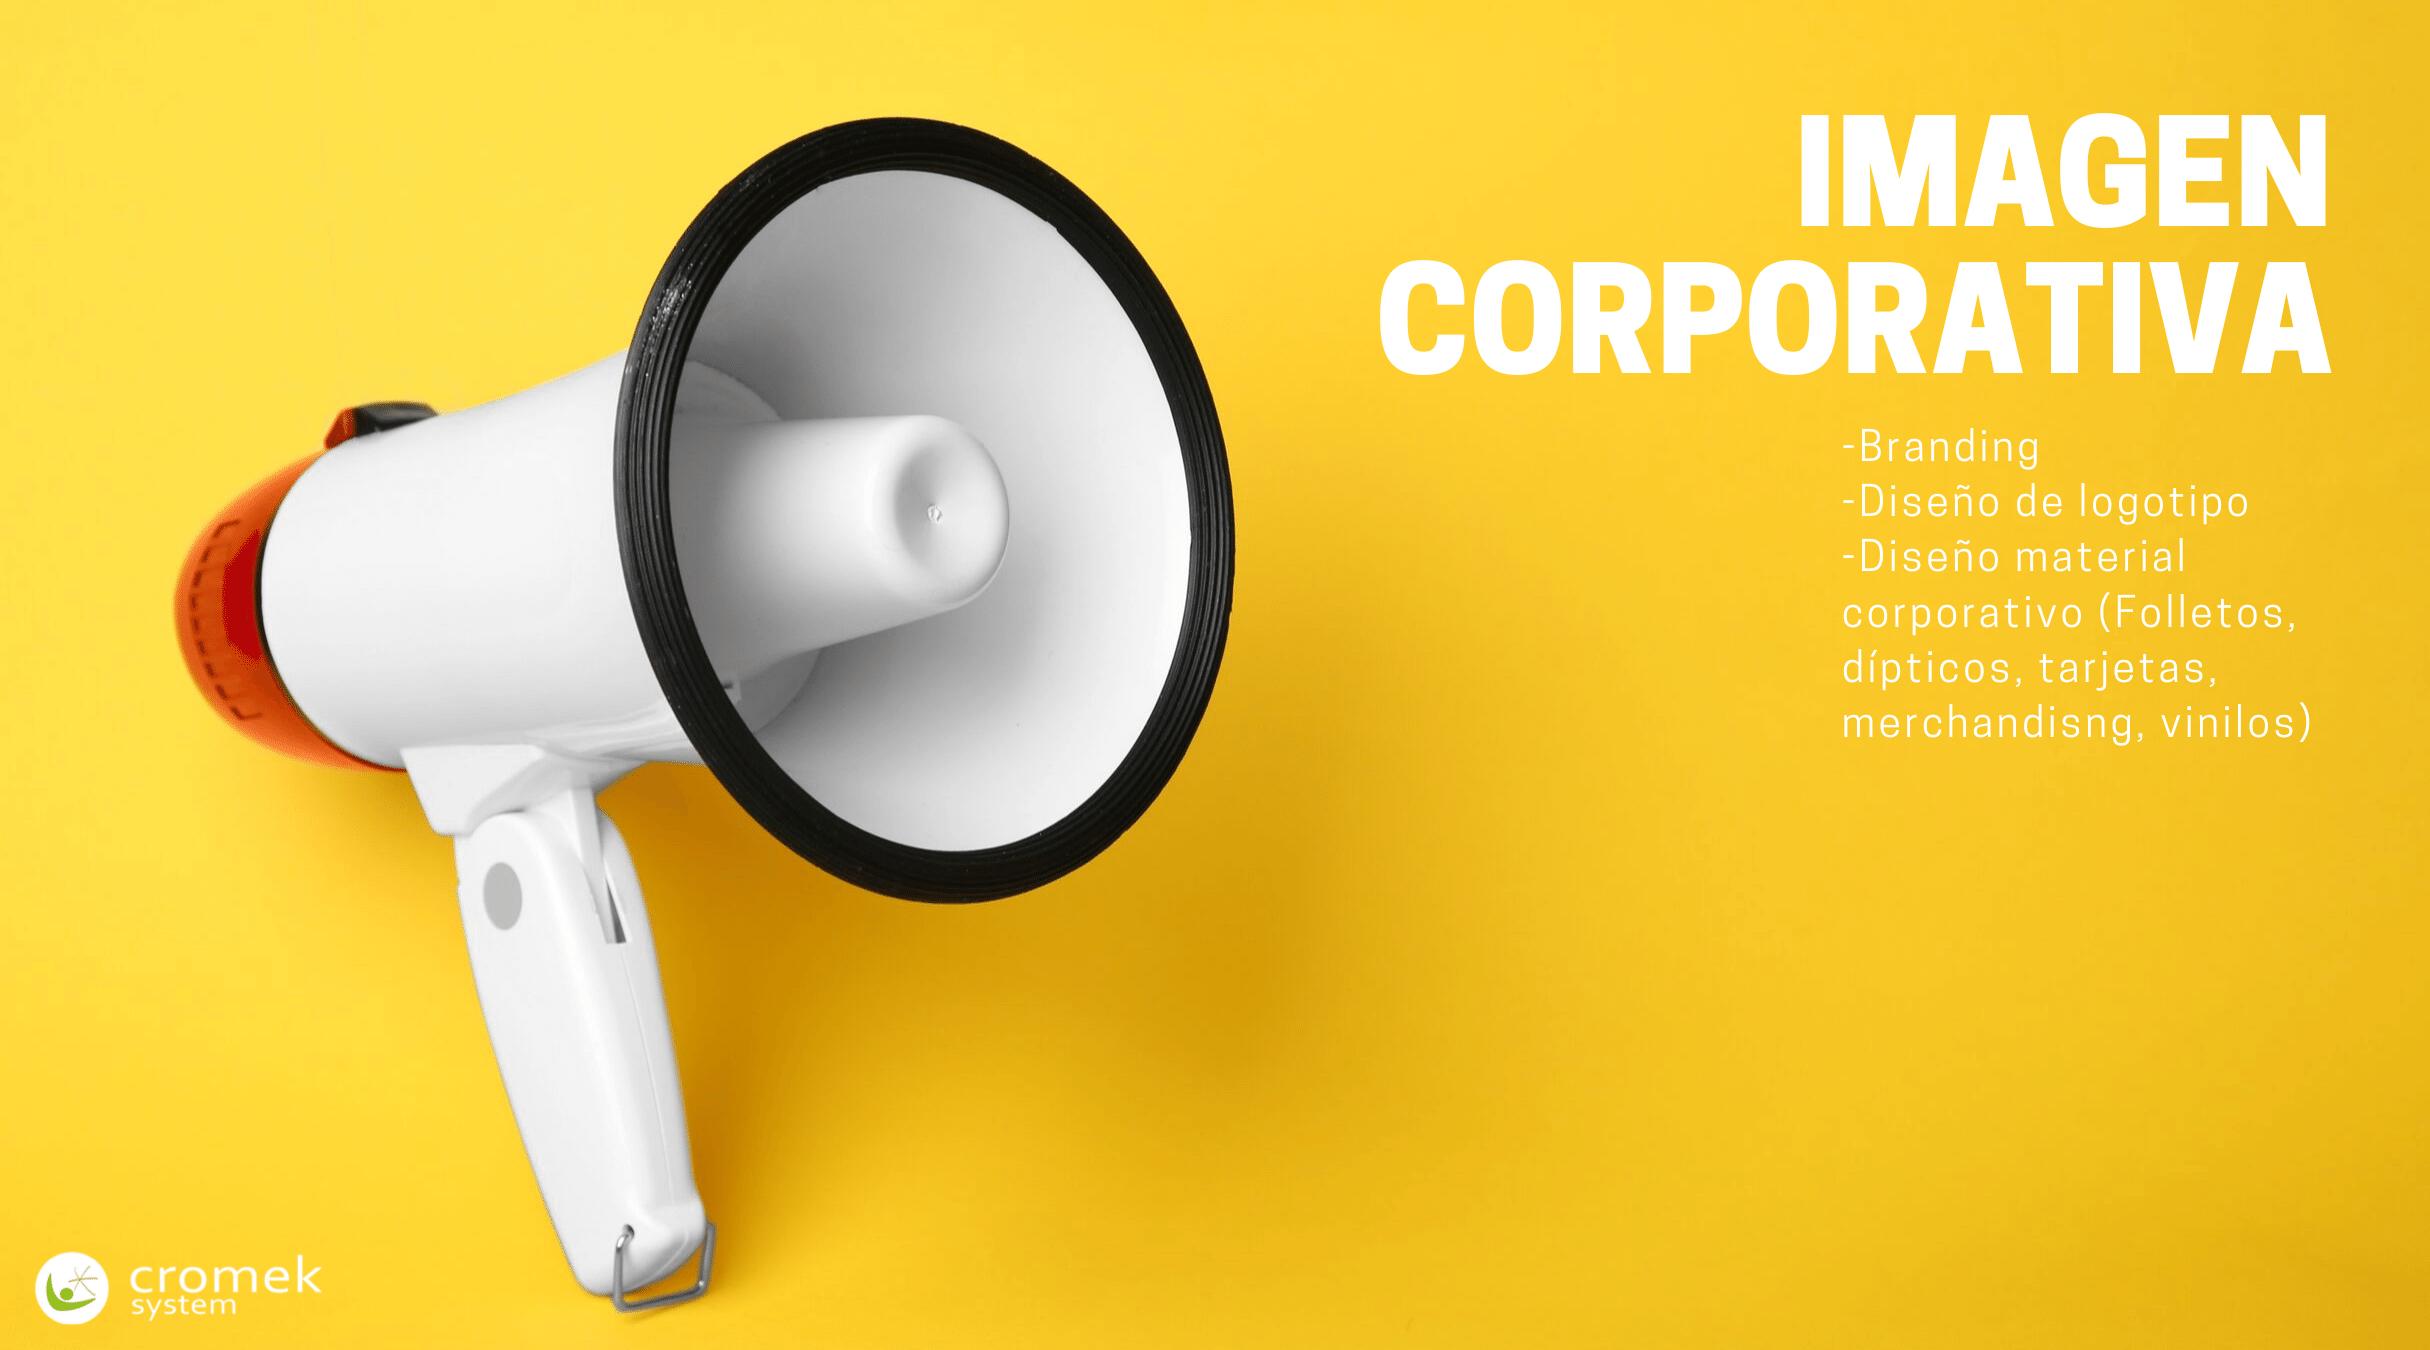 banner-web-imagen-corporativa-cromek-system